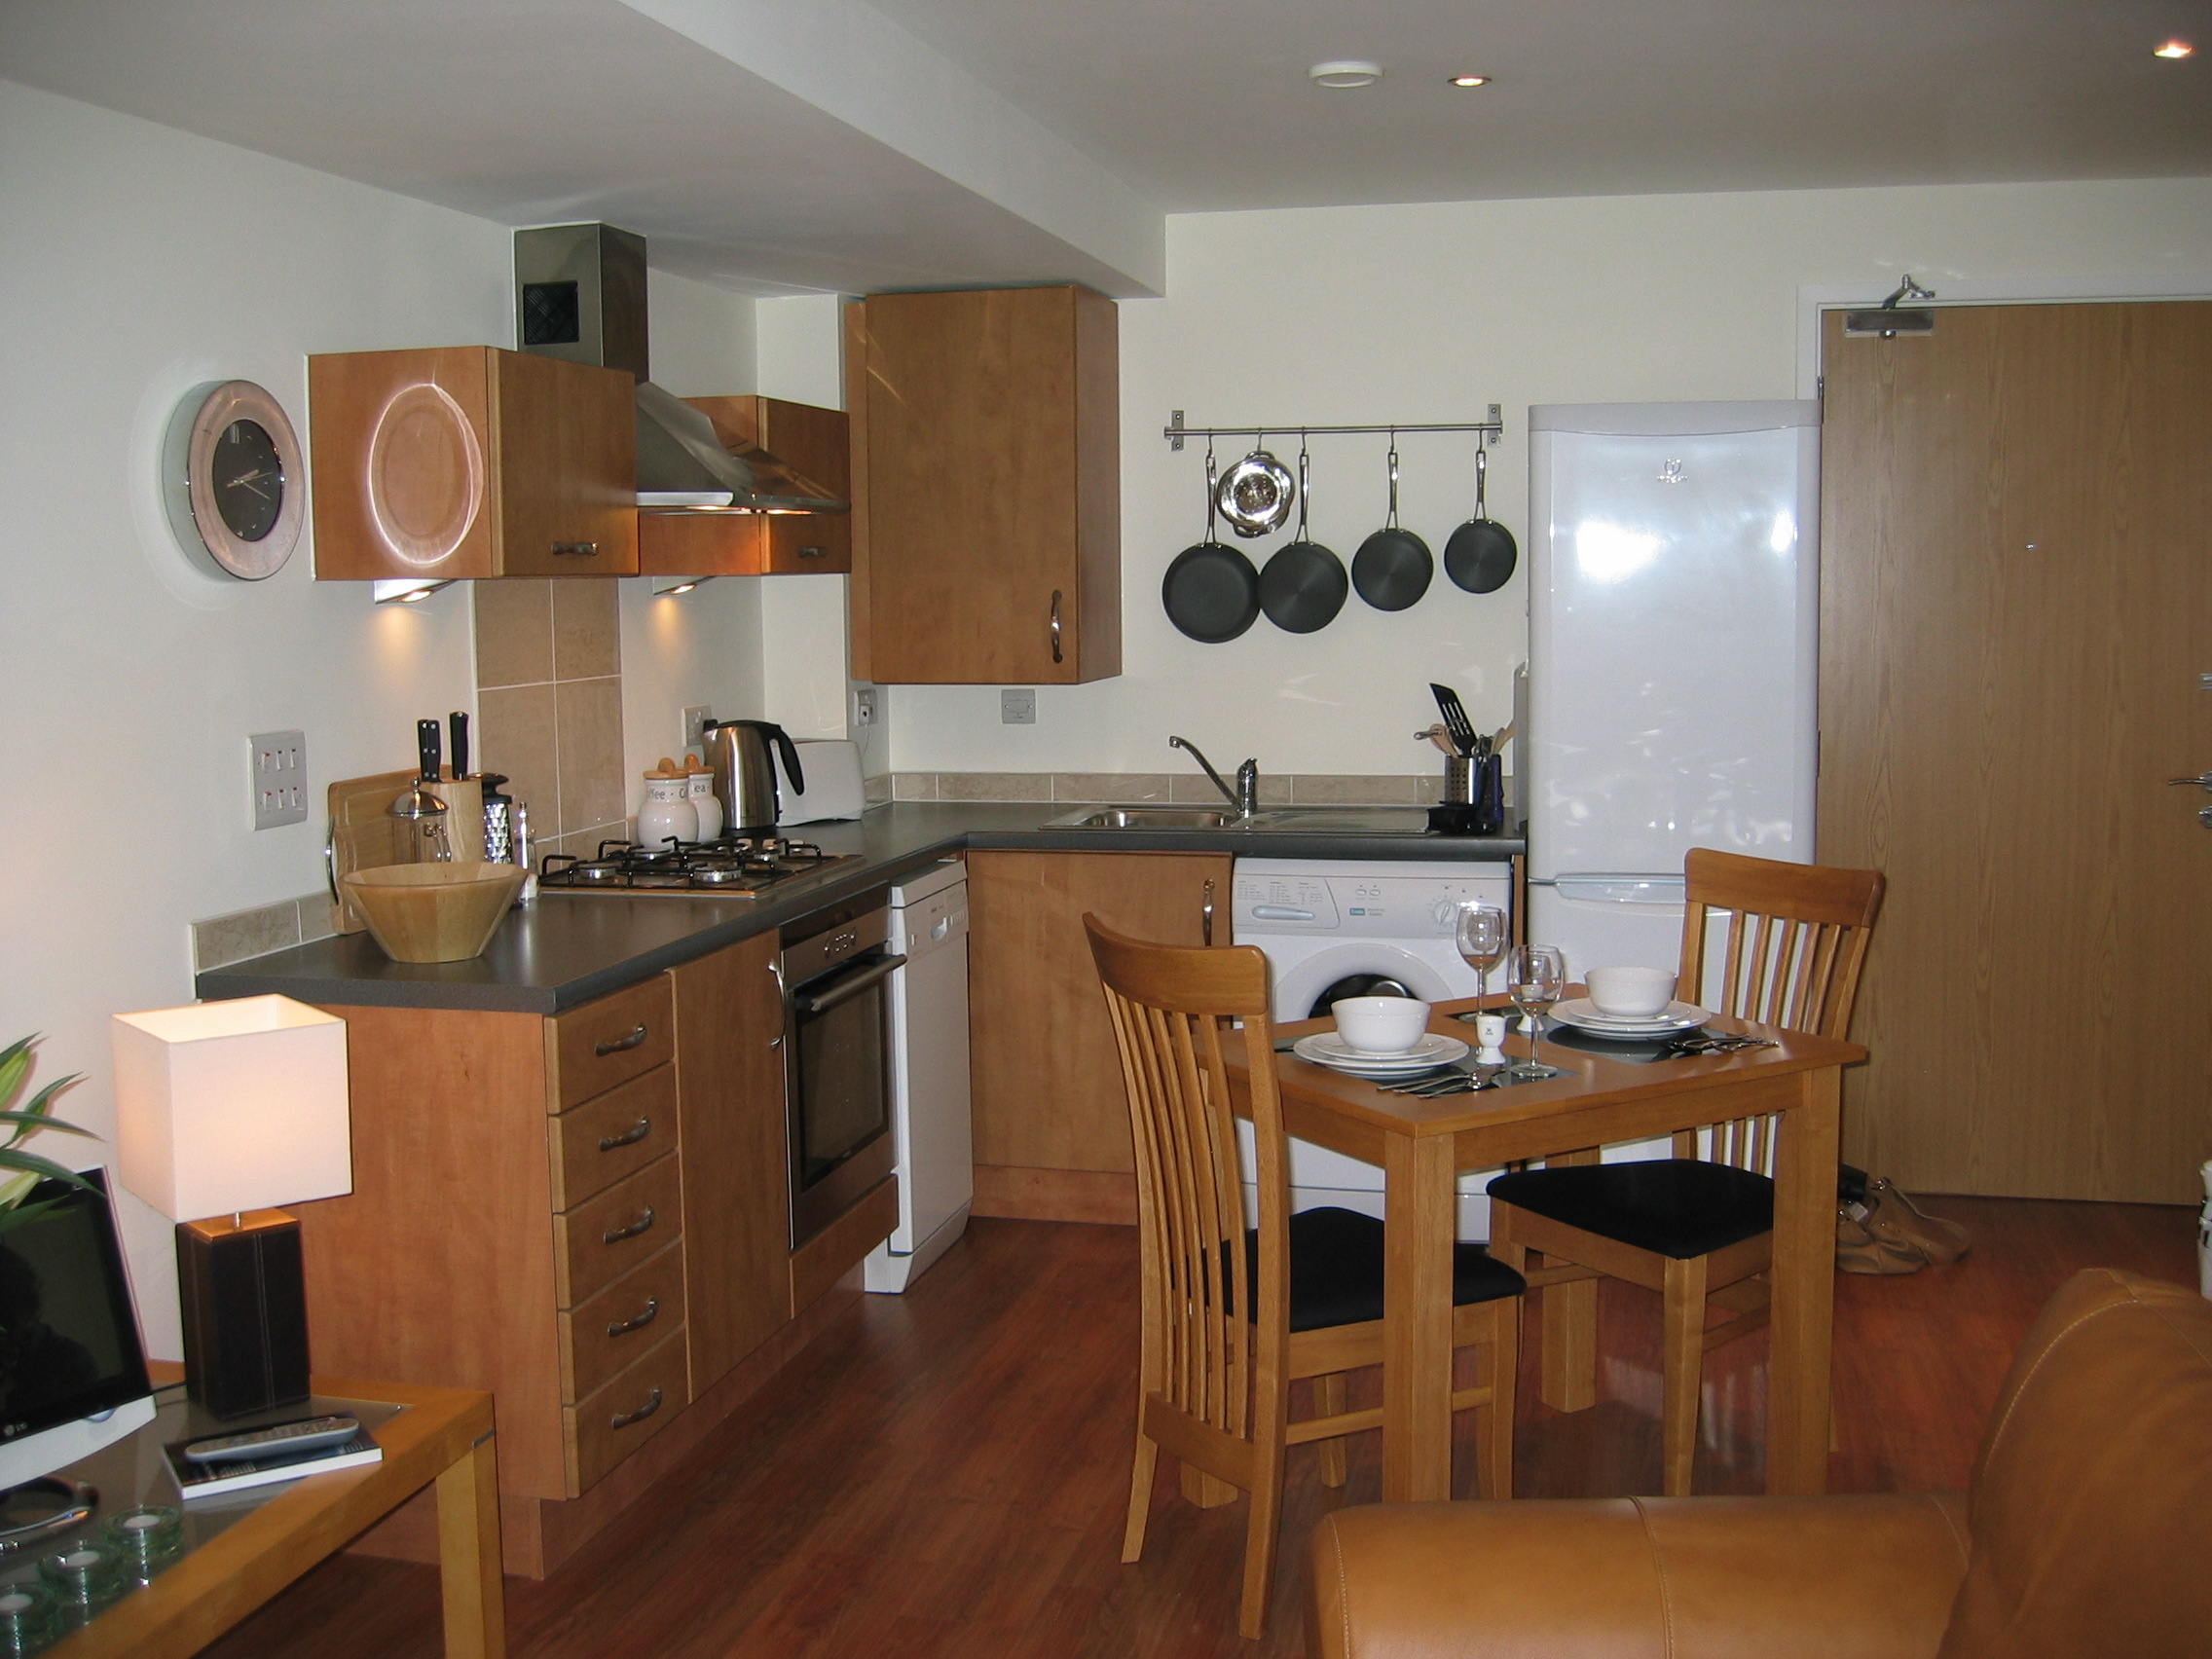 38 idea dekorasi dapur untuk apartment dan kondominium for Studio apartment kitchen designs